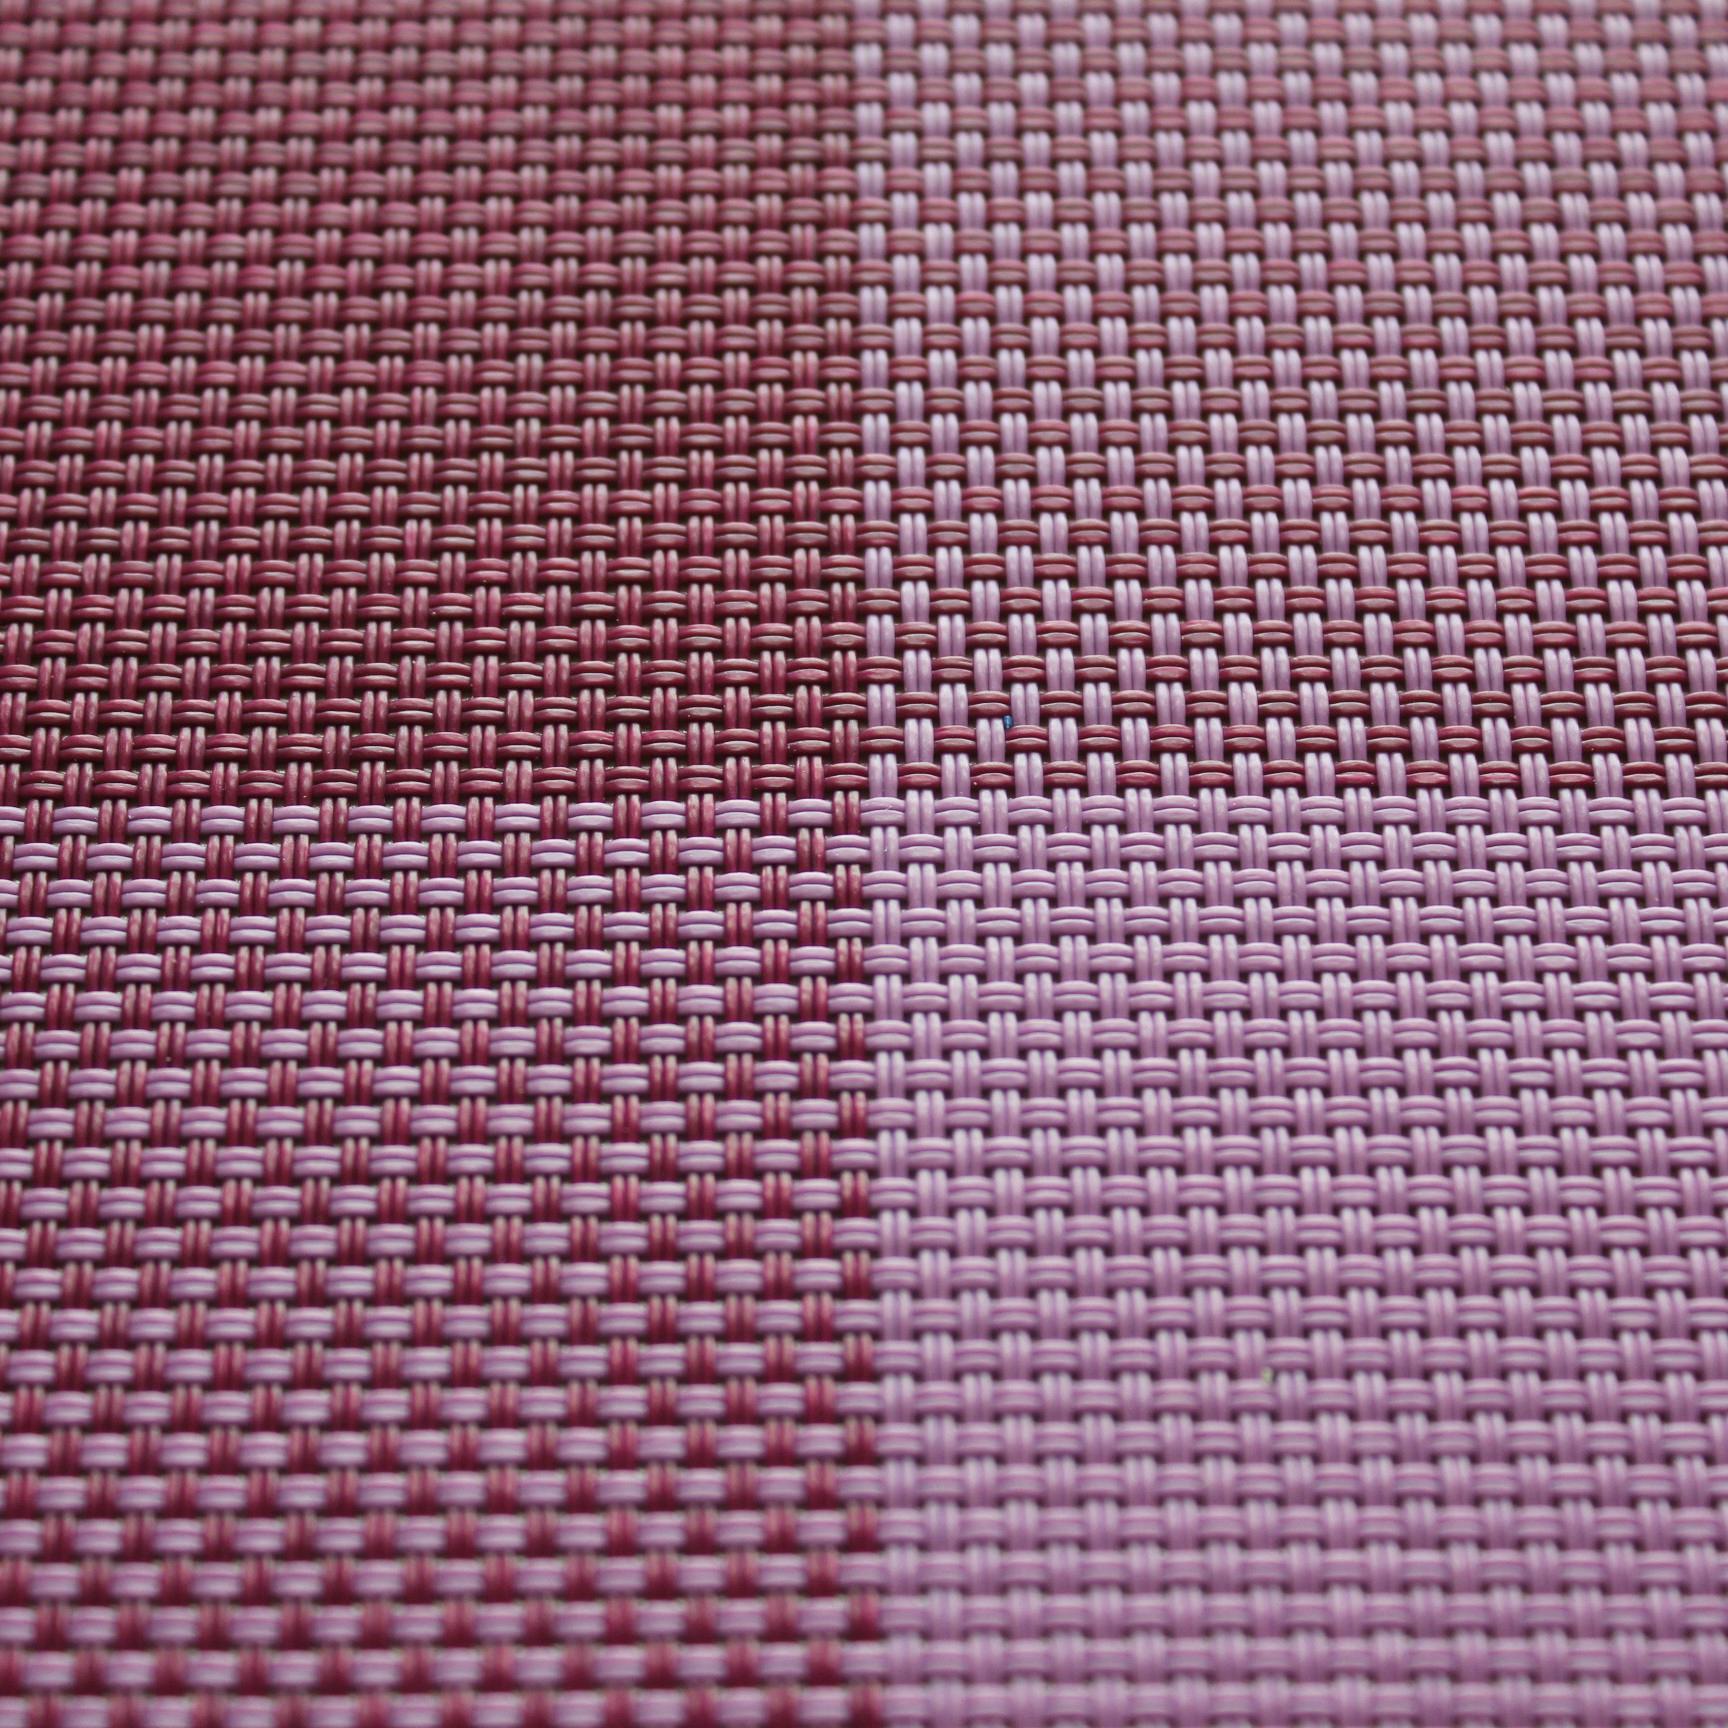 Pvc Woven Coated Fabric 31081 1